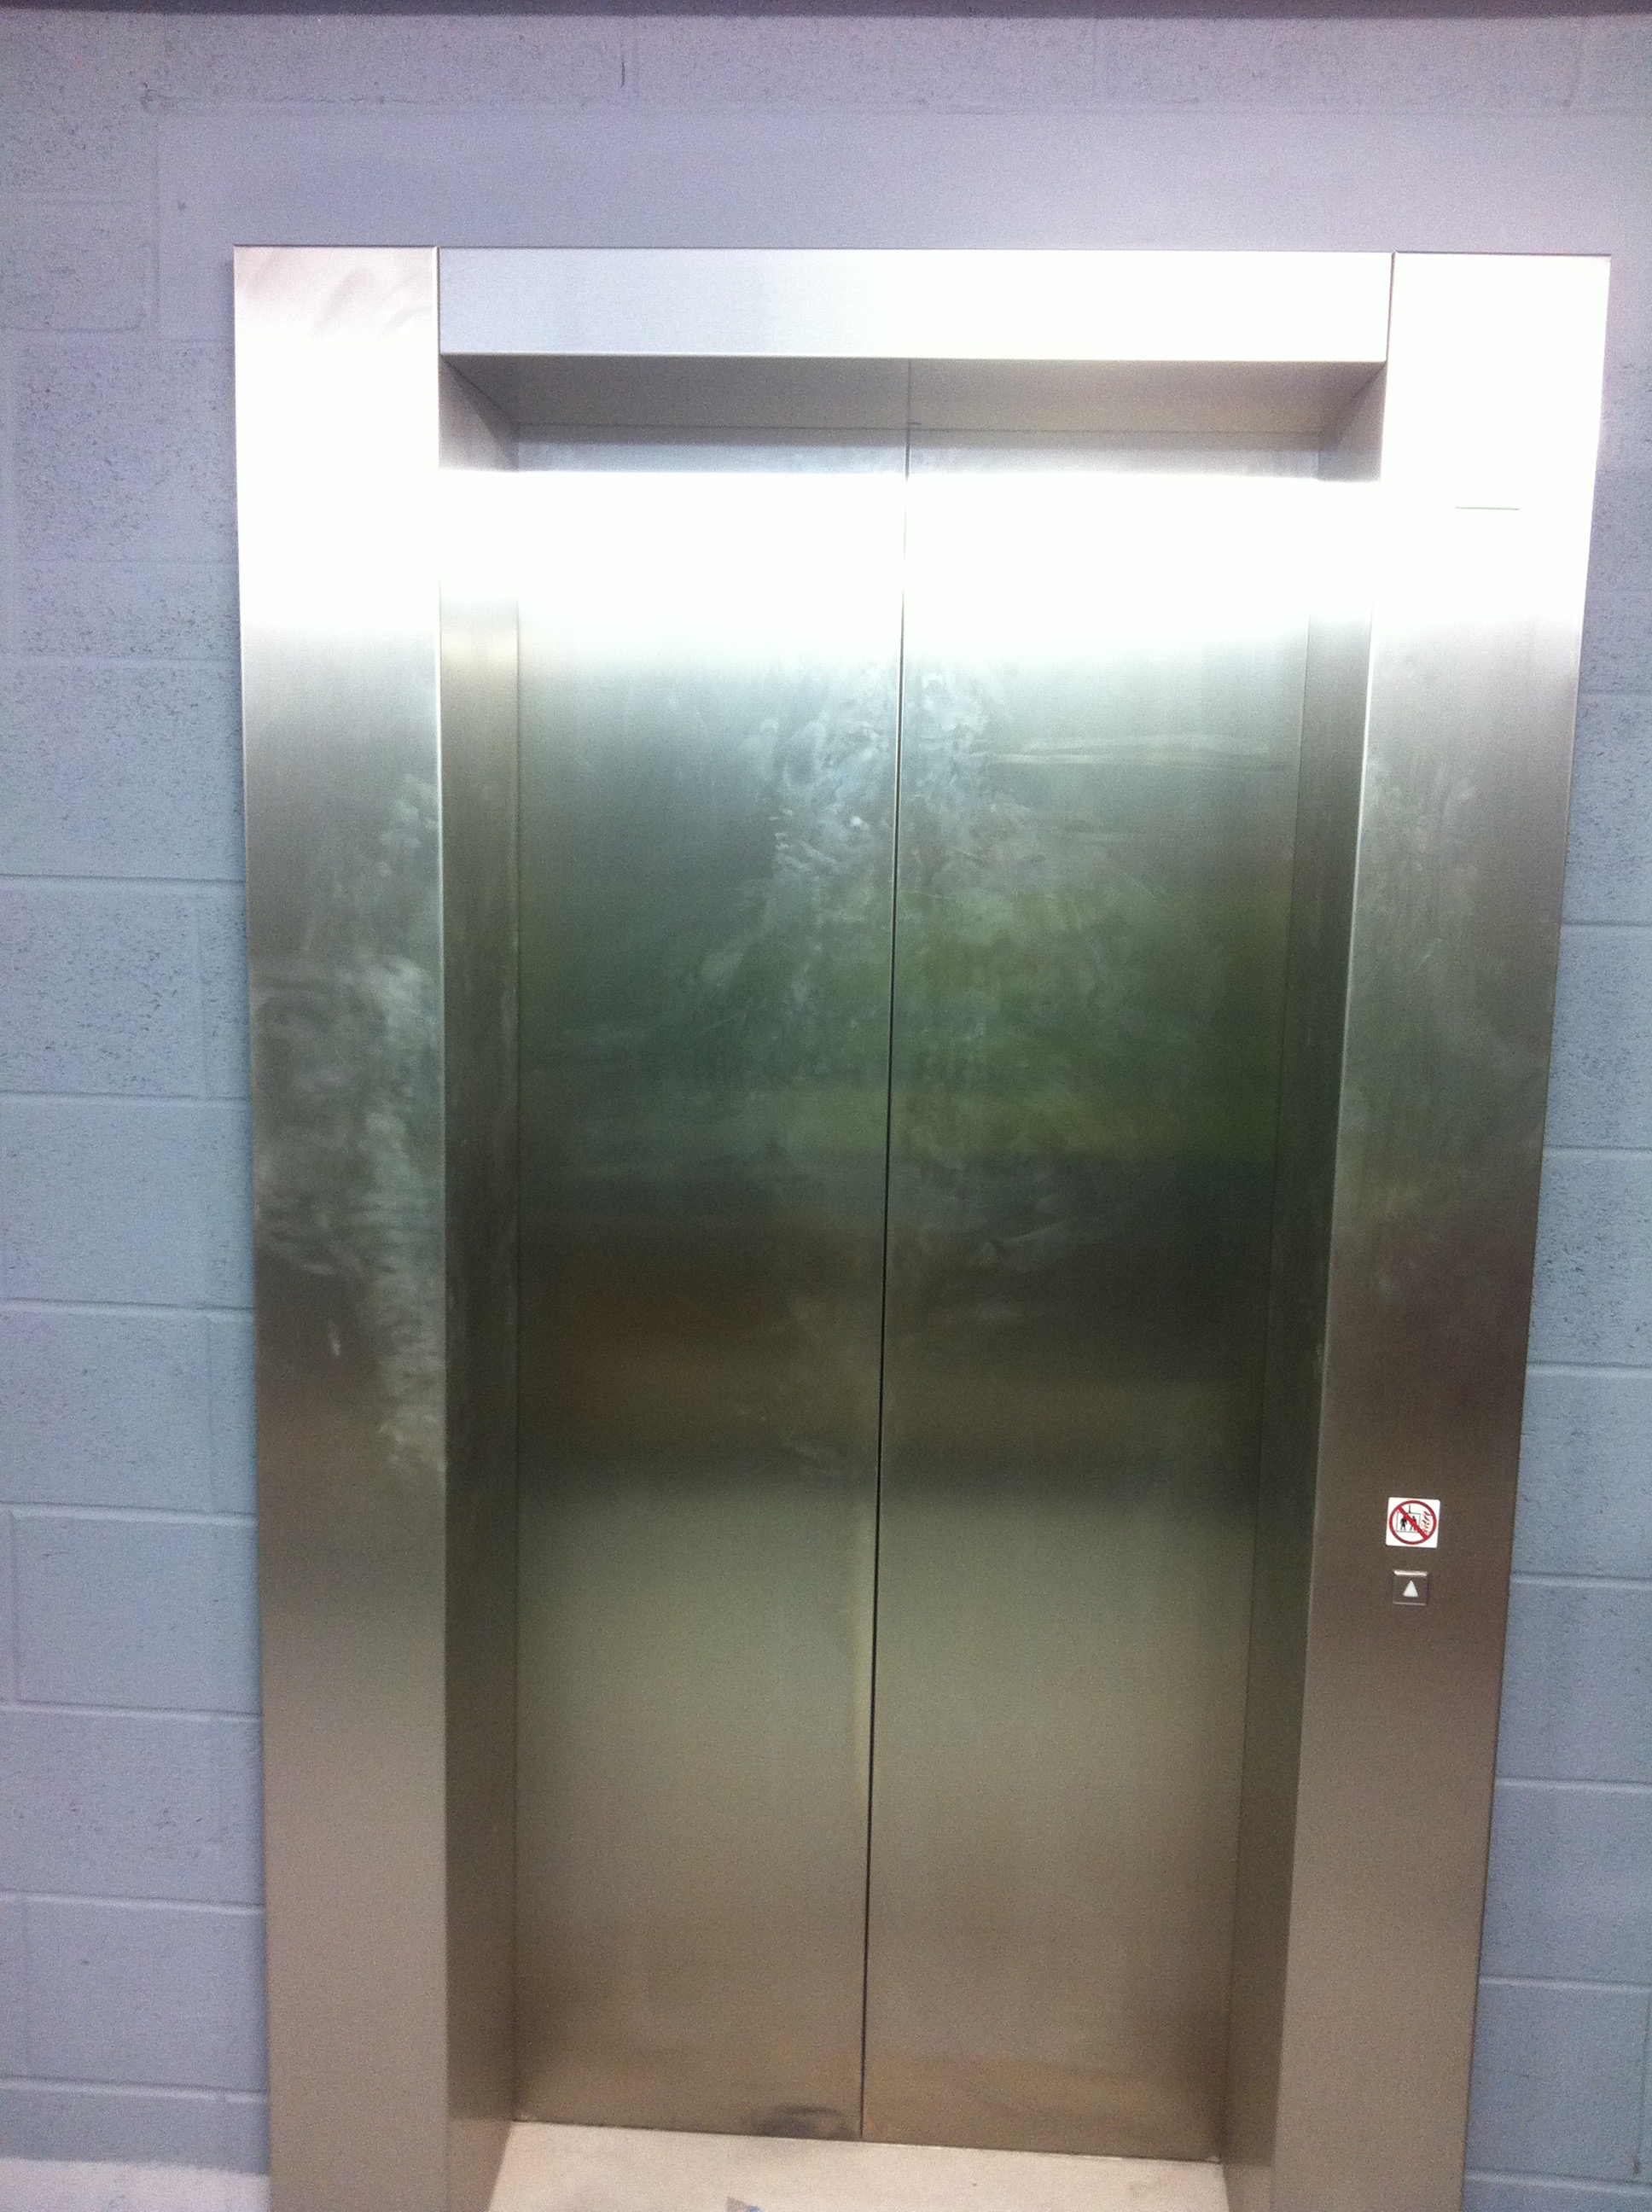 Damaged Lift Doors- Before